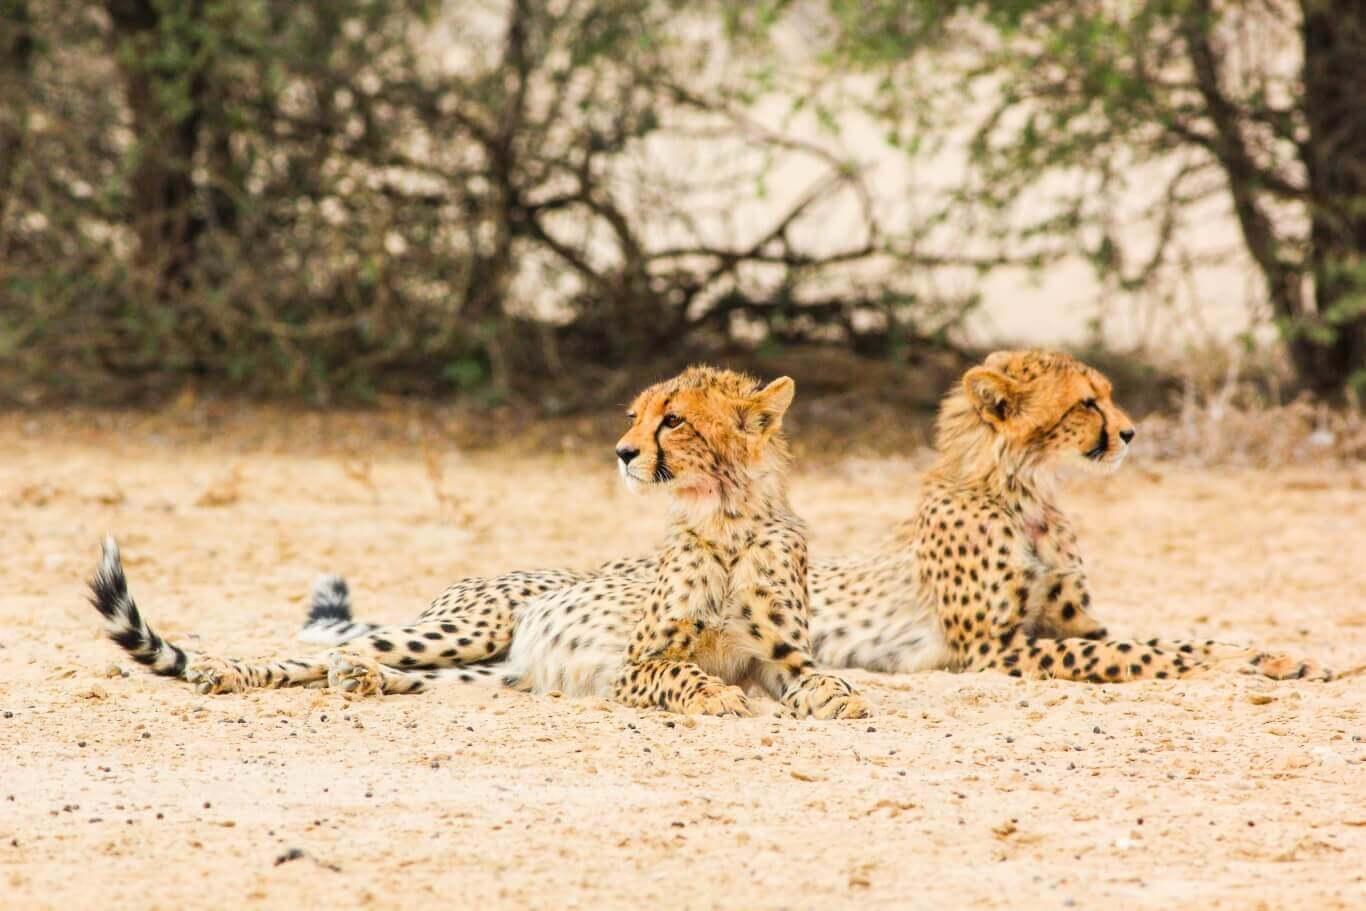 Cheetah tracking in the Karoo